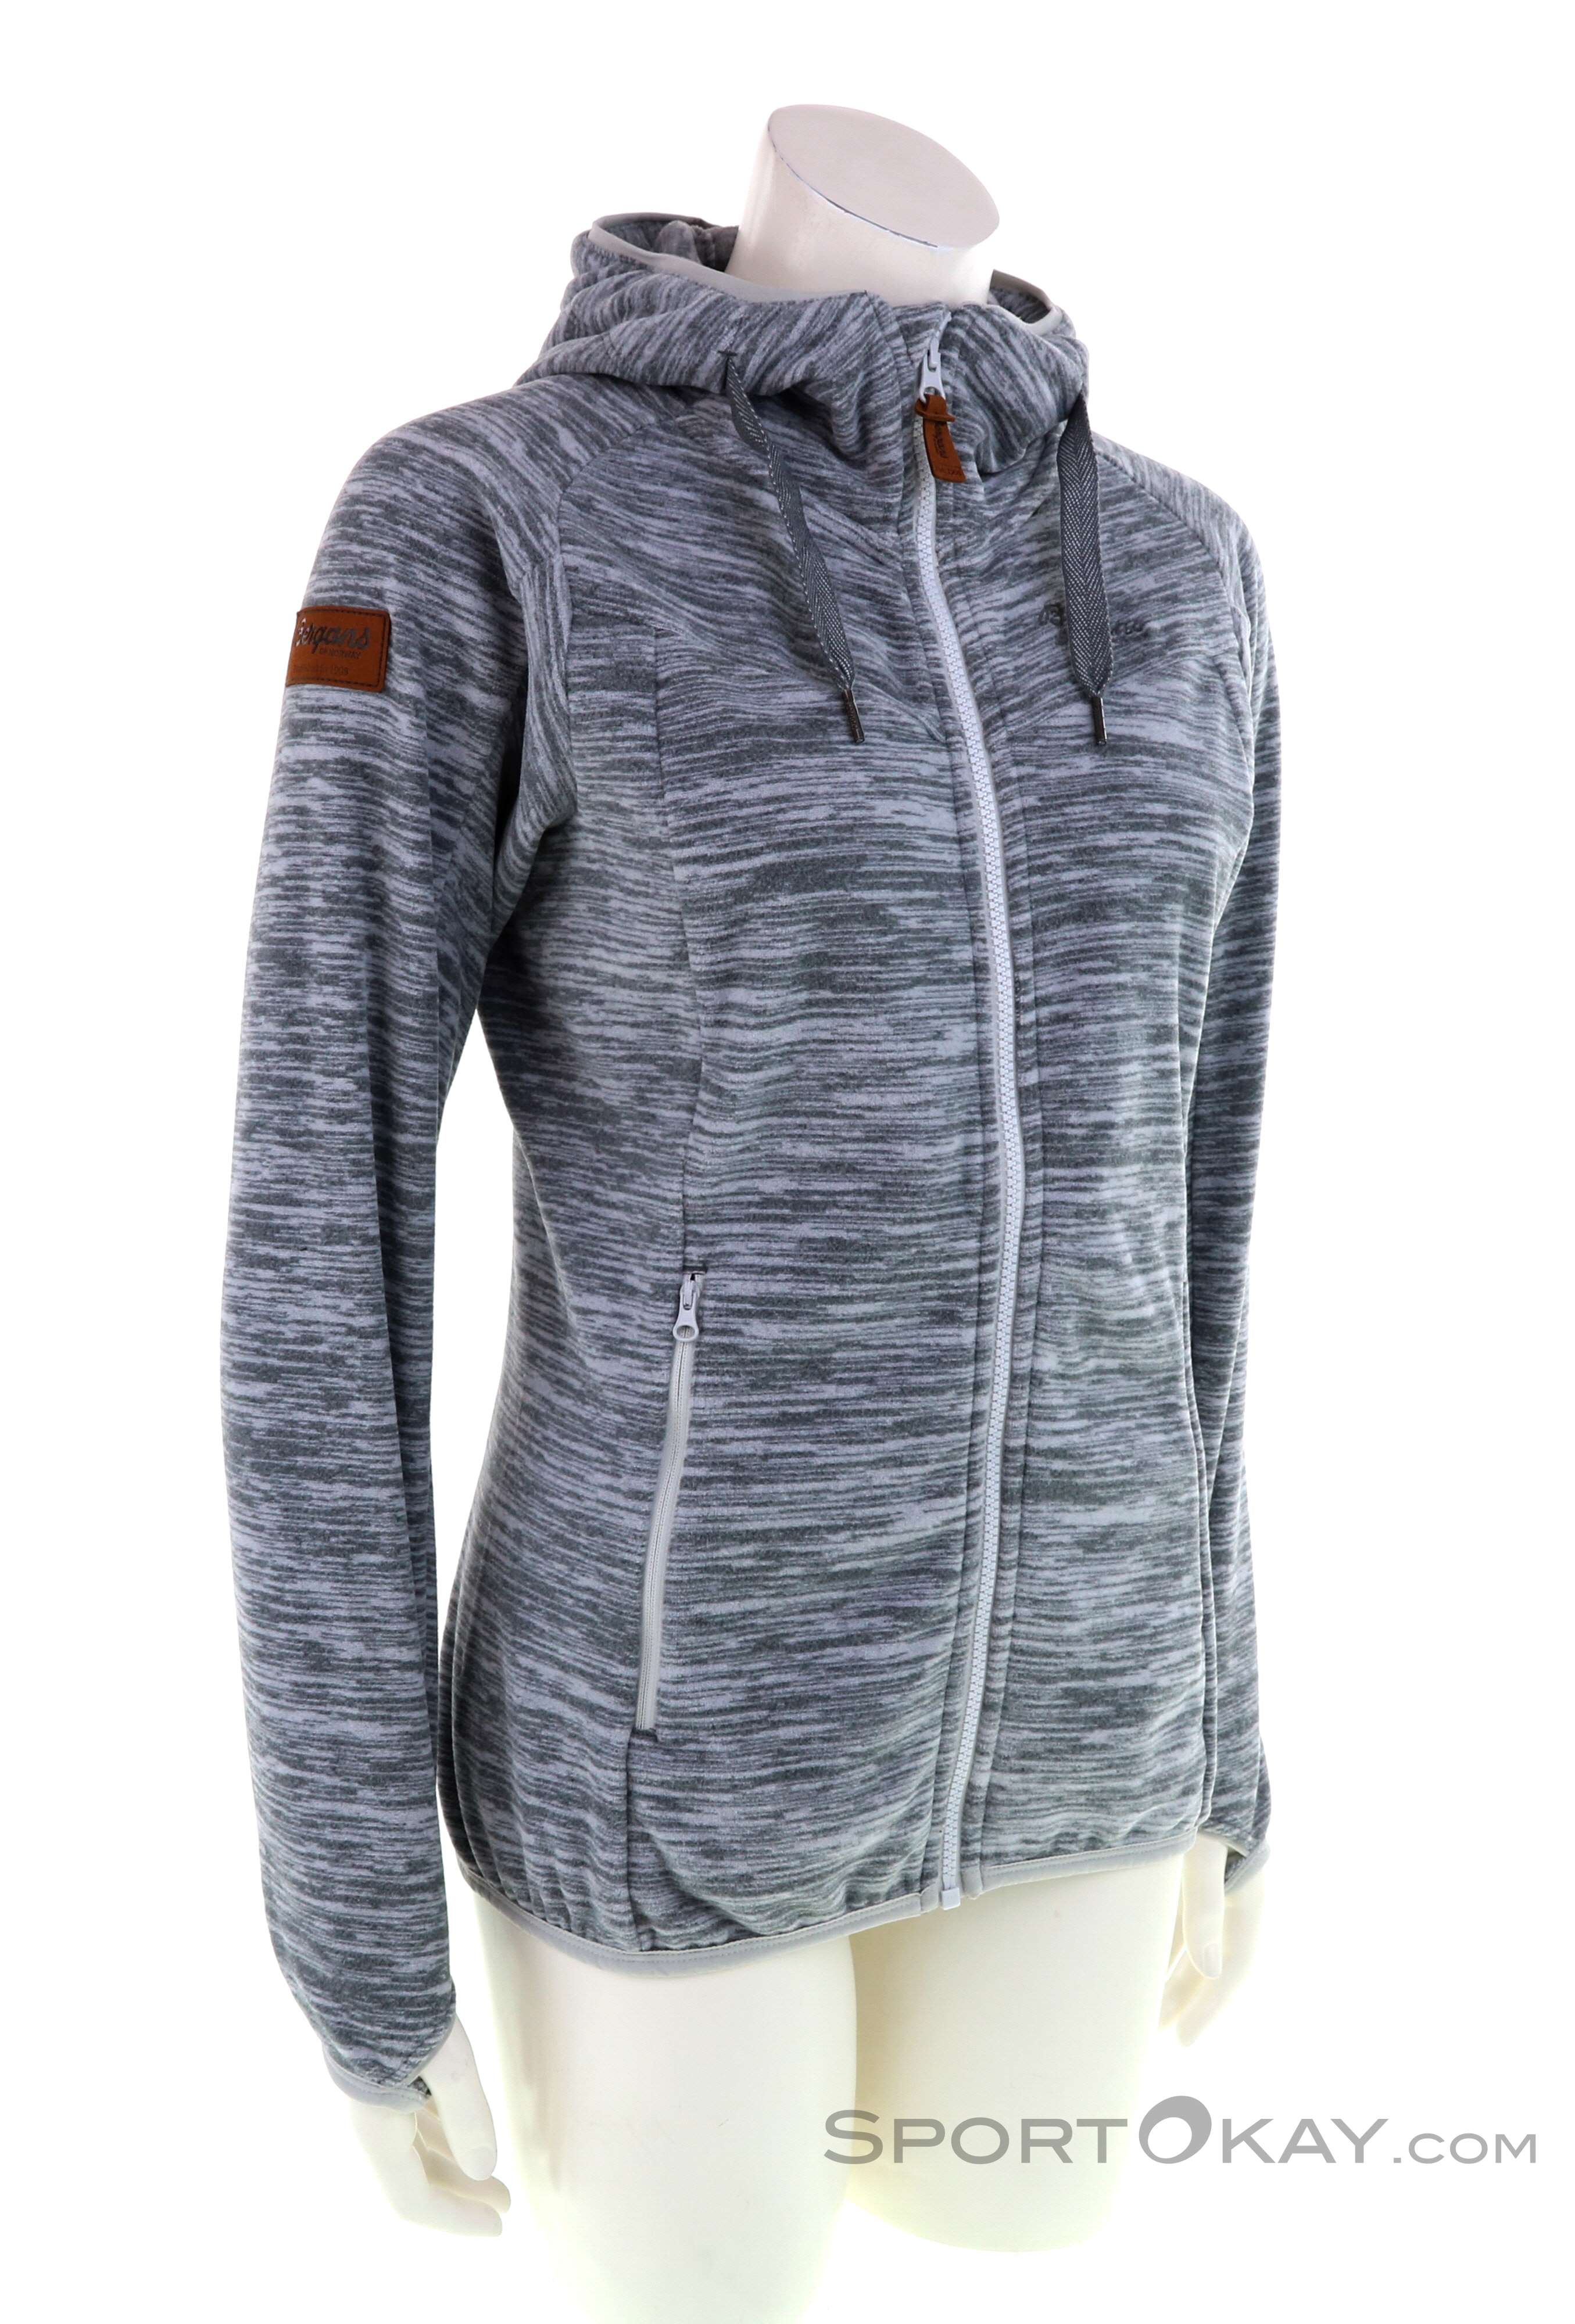 Bergans Hareid Fleece Damen Fleecejacke   Sweater ...